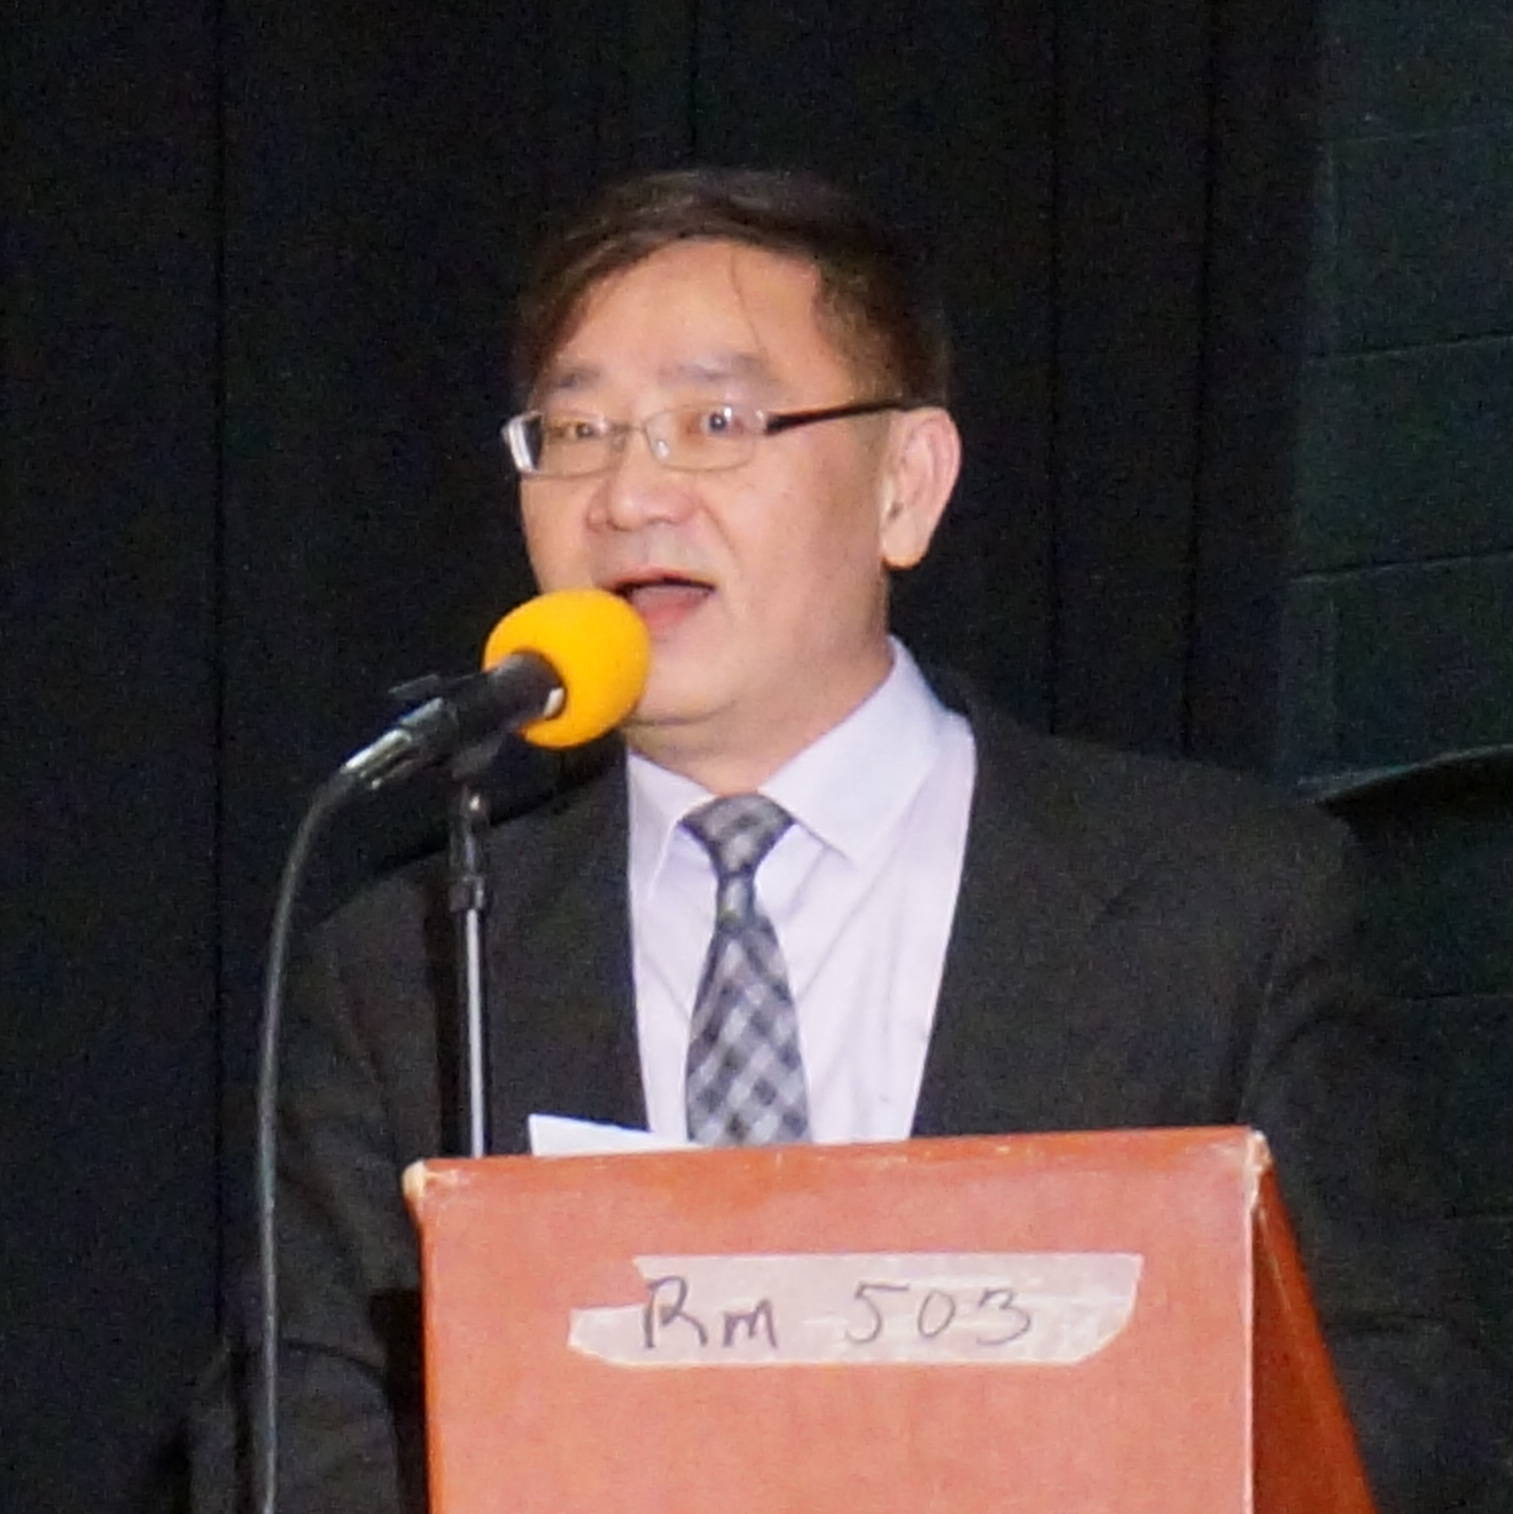 af7816896efc7700aa66_a_Principal_Dr._Jimmy_Chiang.JPG